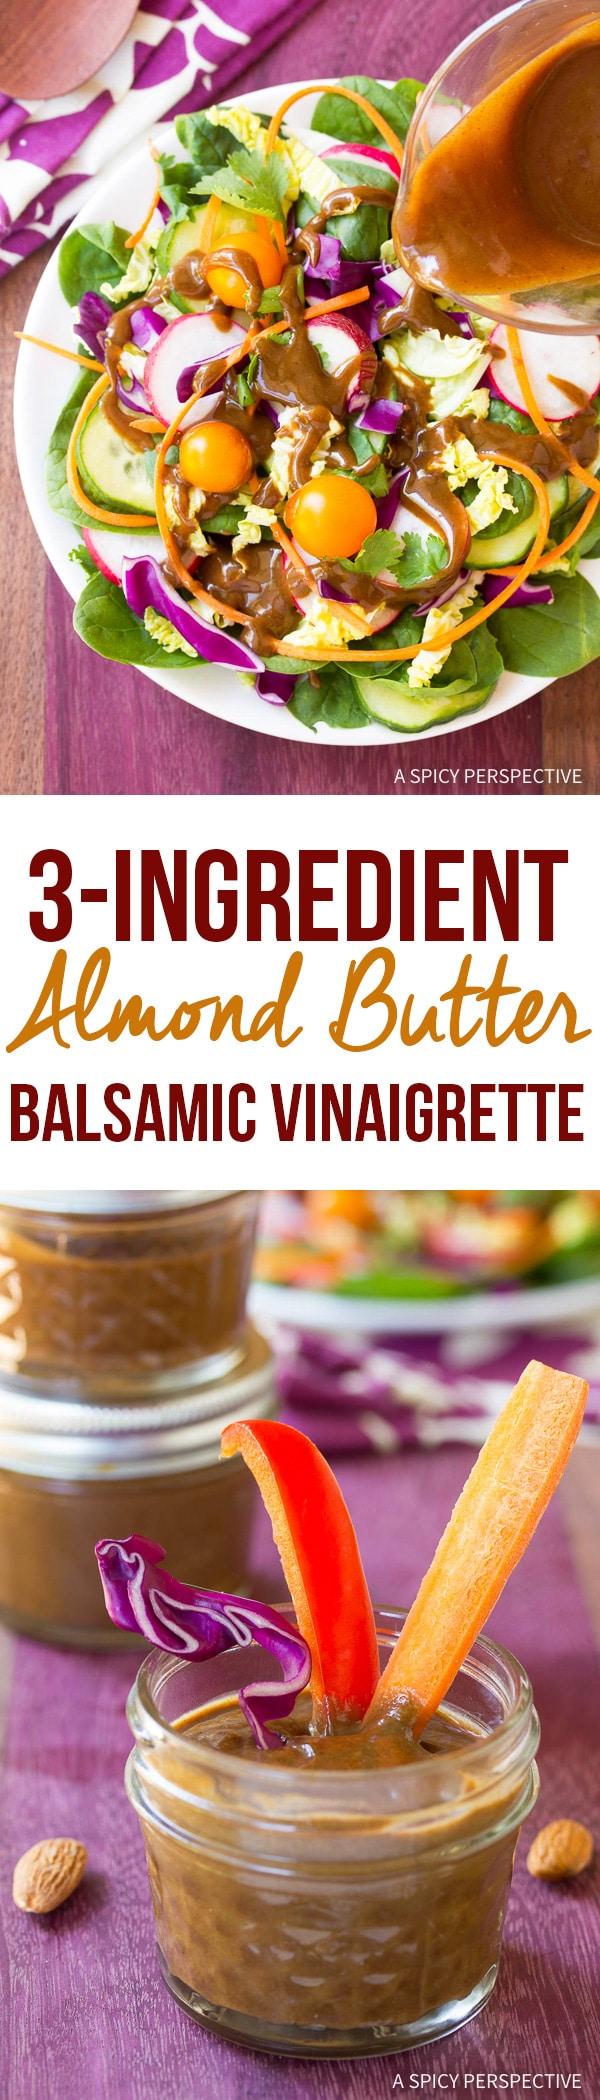 Healthy 3-Ingredient Almond Butter Balsamic Vinaigrette Recipe